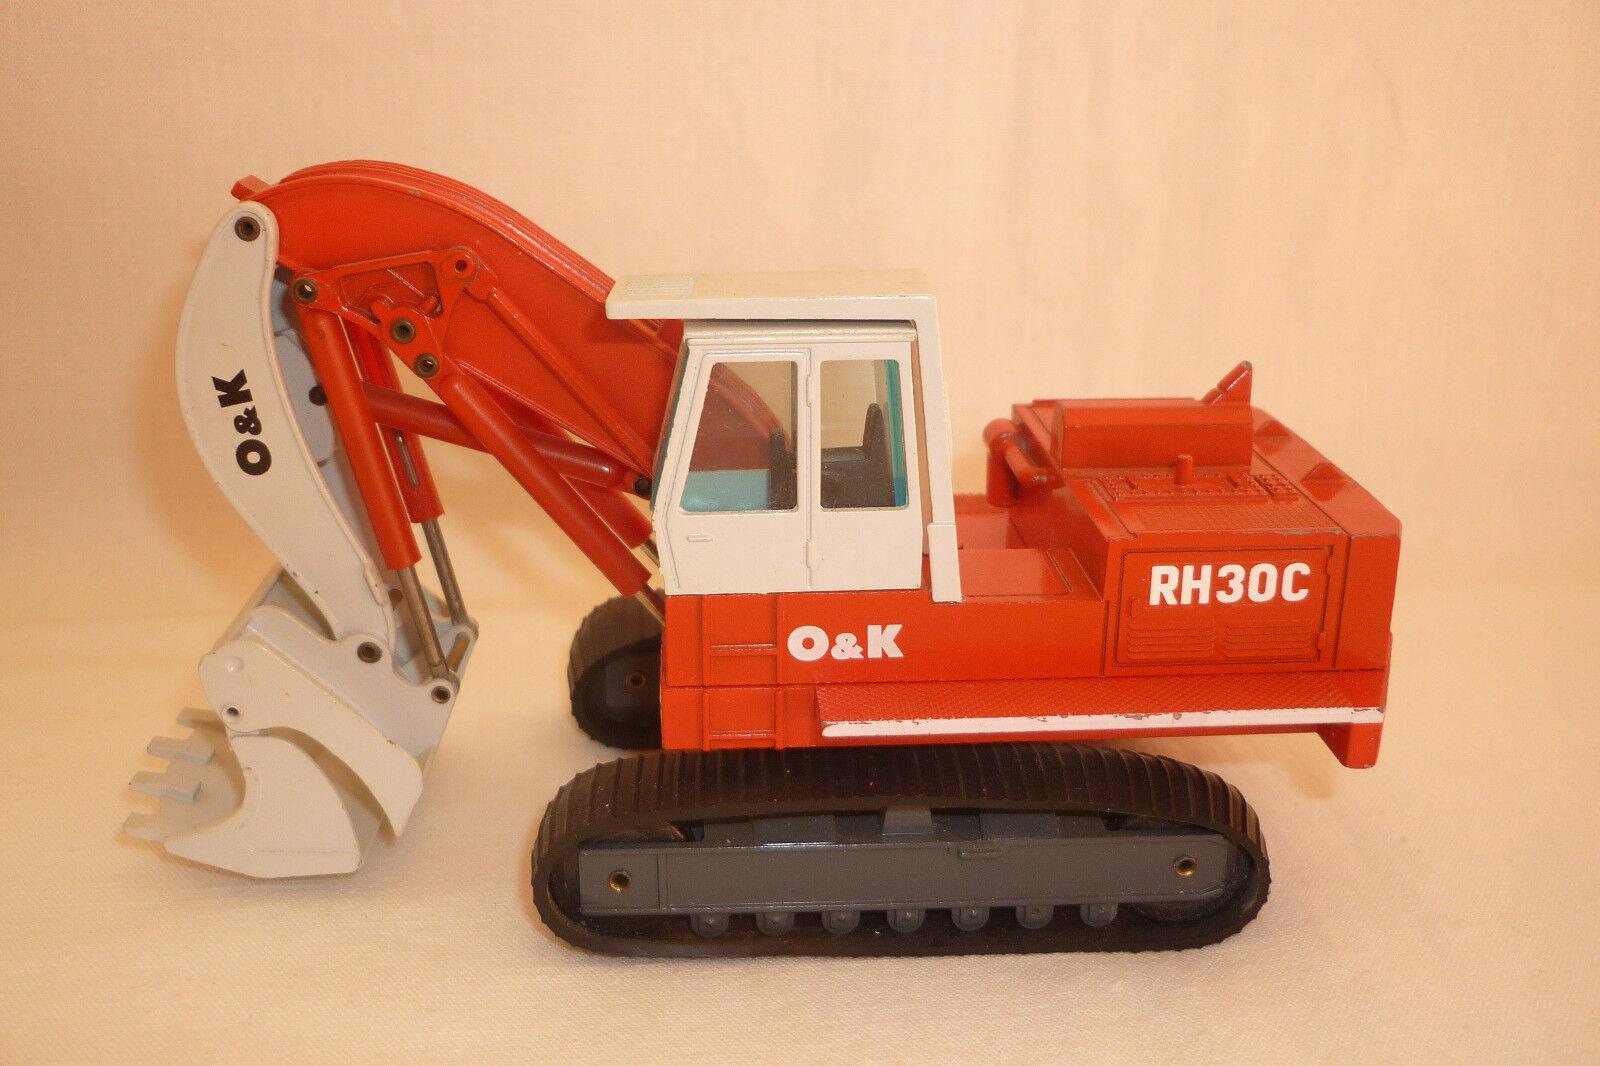 Nzg - Miniatura de Metal - o & k Rh 30C - Excavadora sobre Orugas - 1 50 -